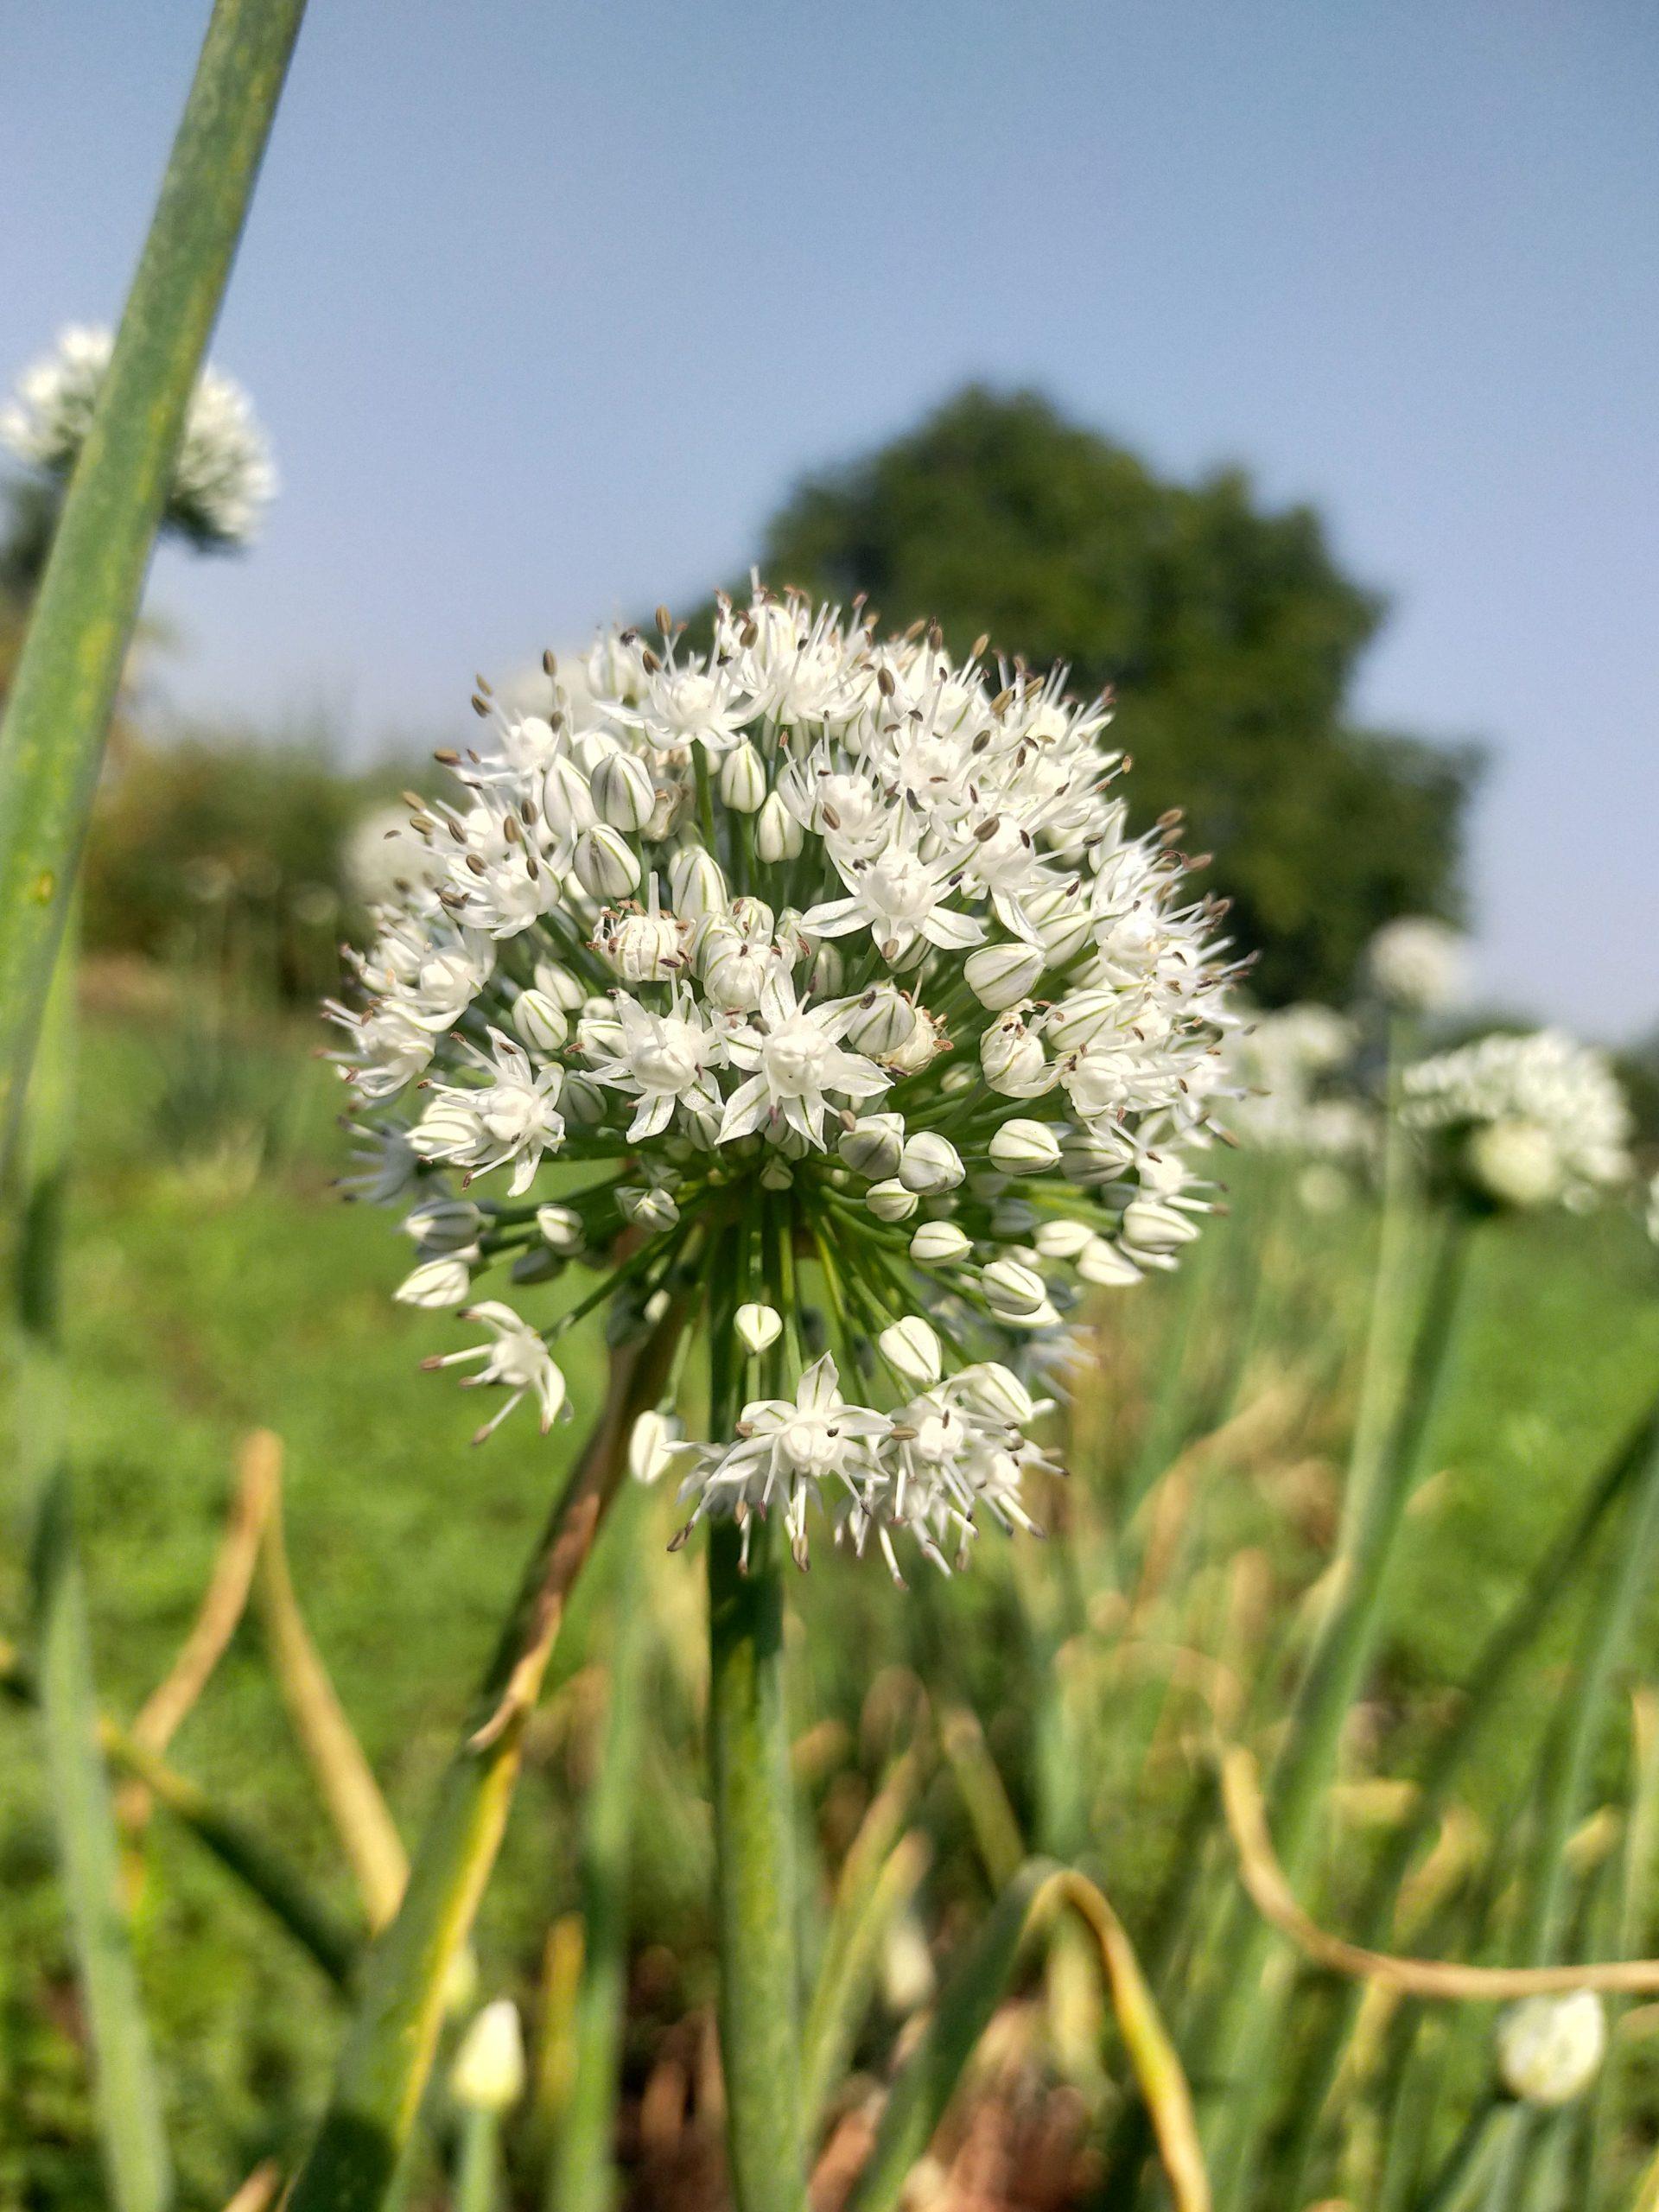 Onion plant flower